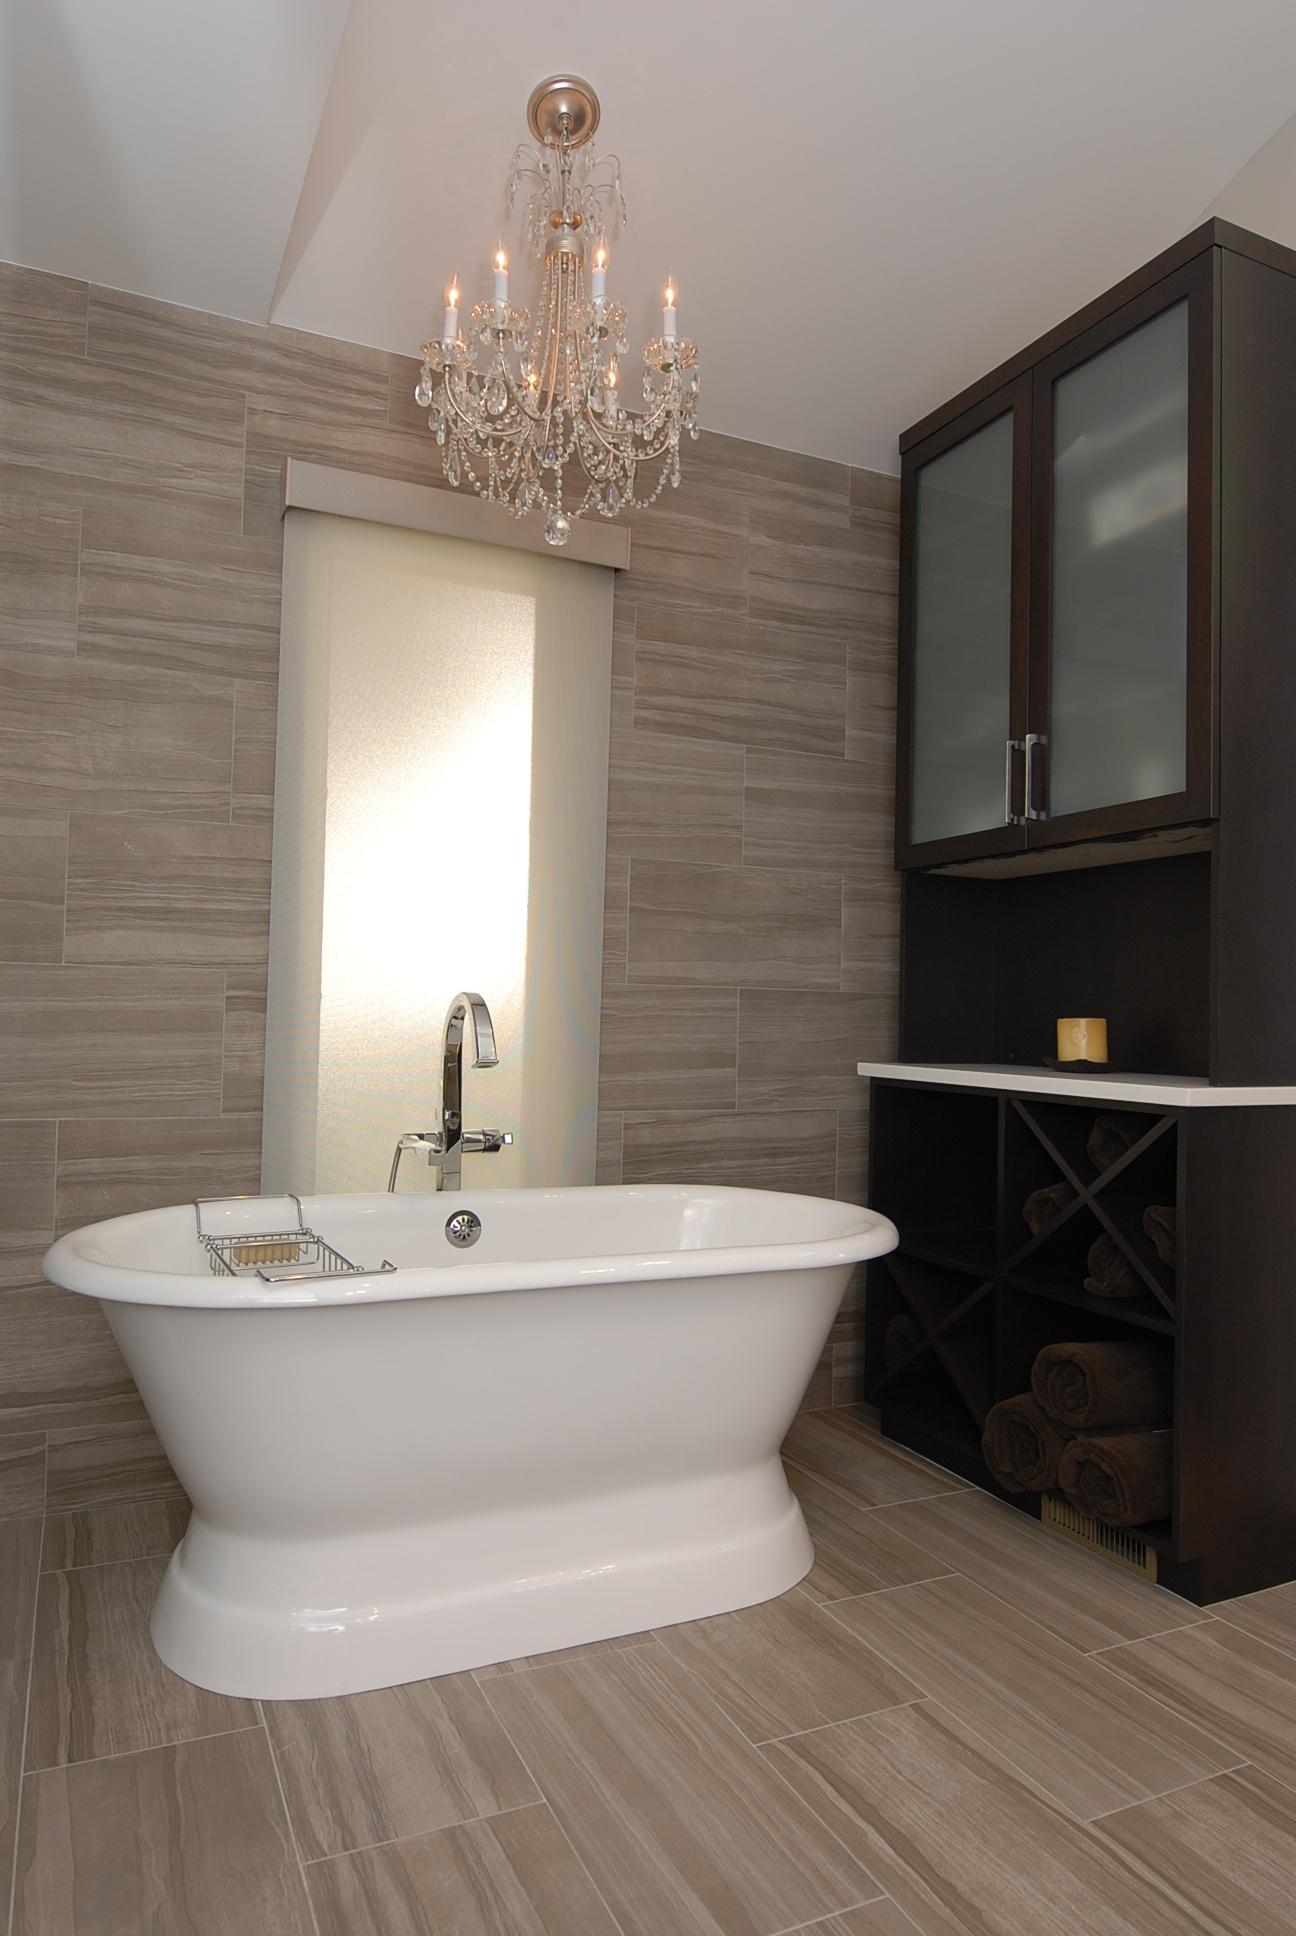 Charmant Kitchens U0026 Baths Unlimited